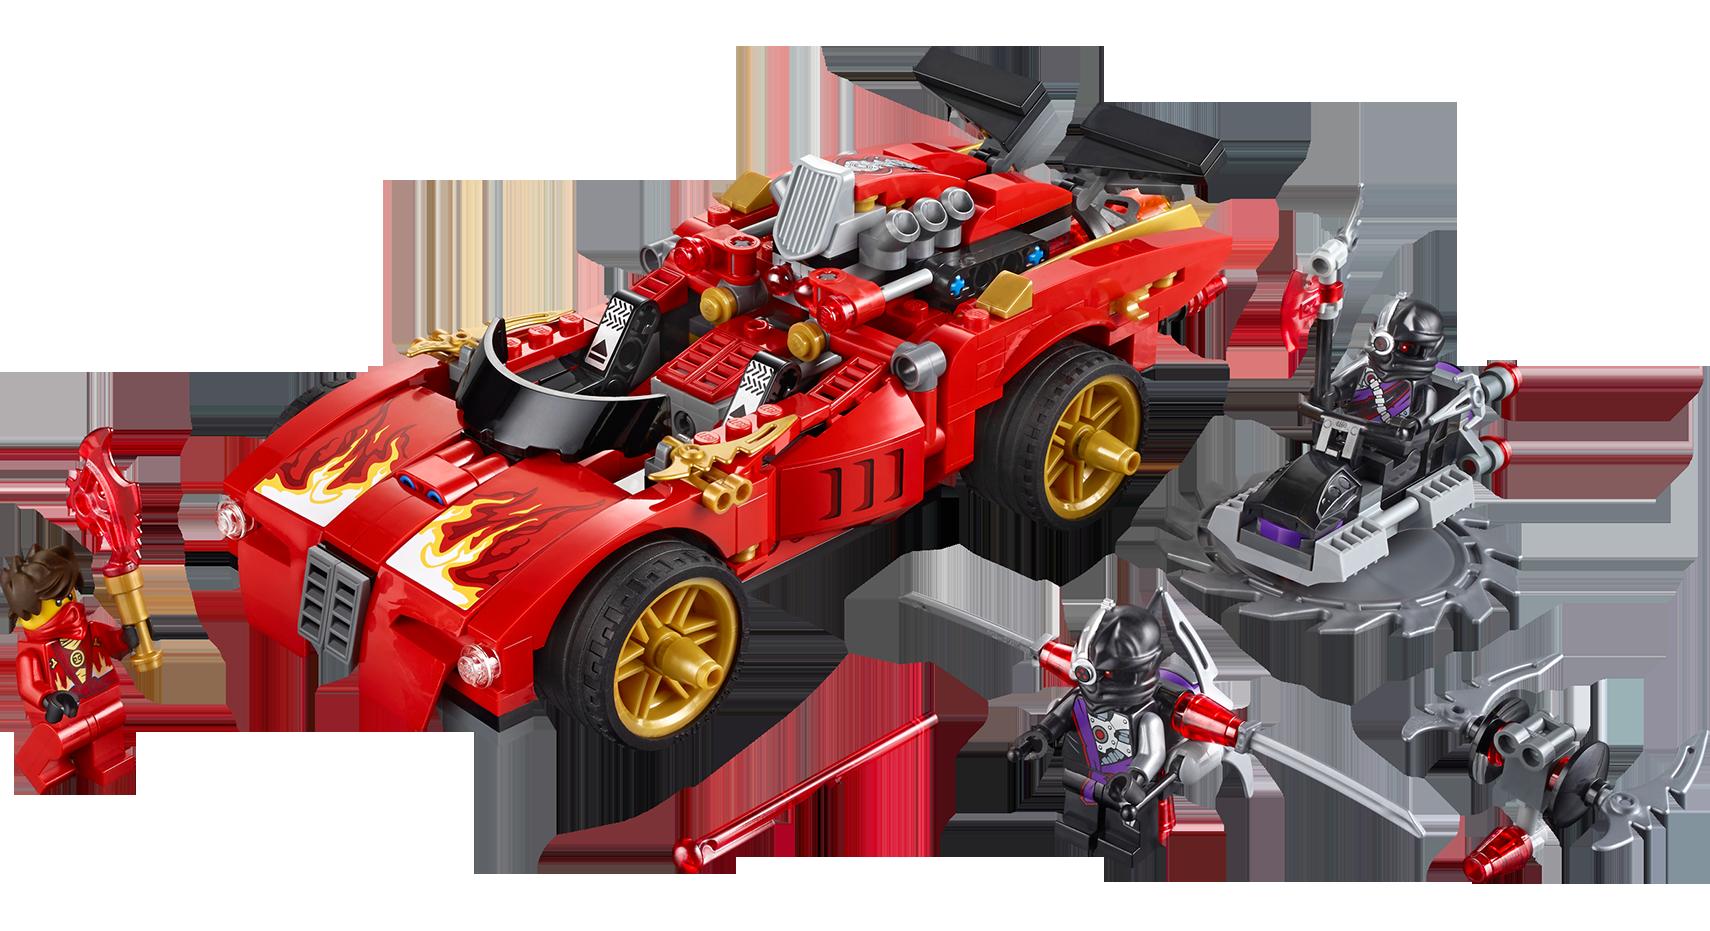 Kai Nindroid 70721 70727 Lego NINJAGO Weapon TECHNO BLADE Techno-Blade Red